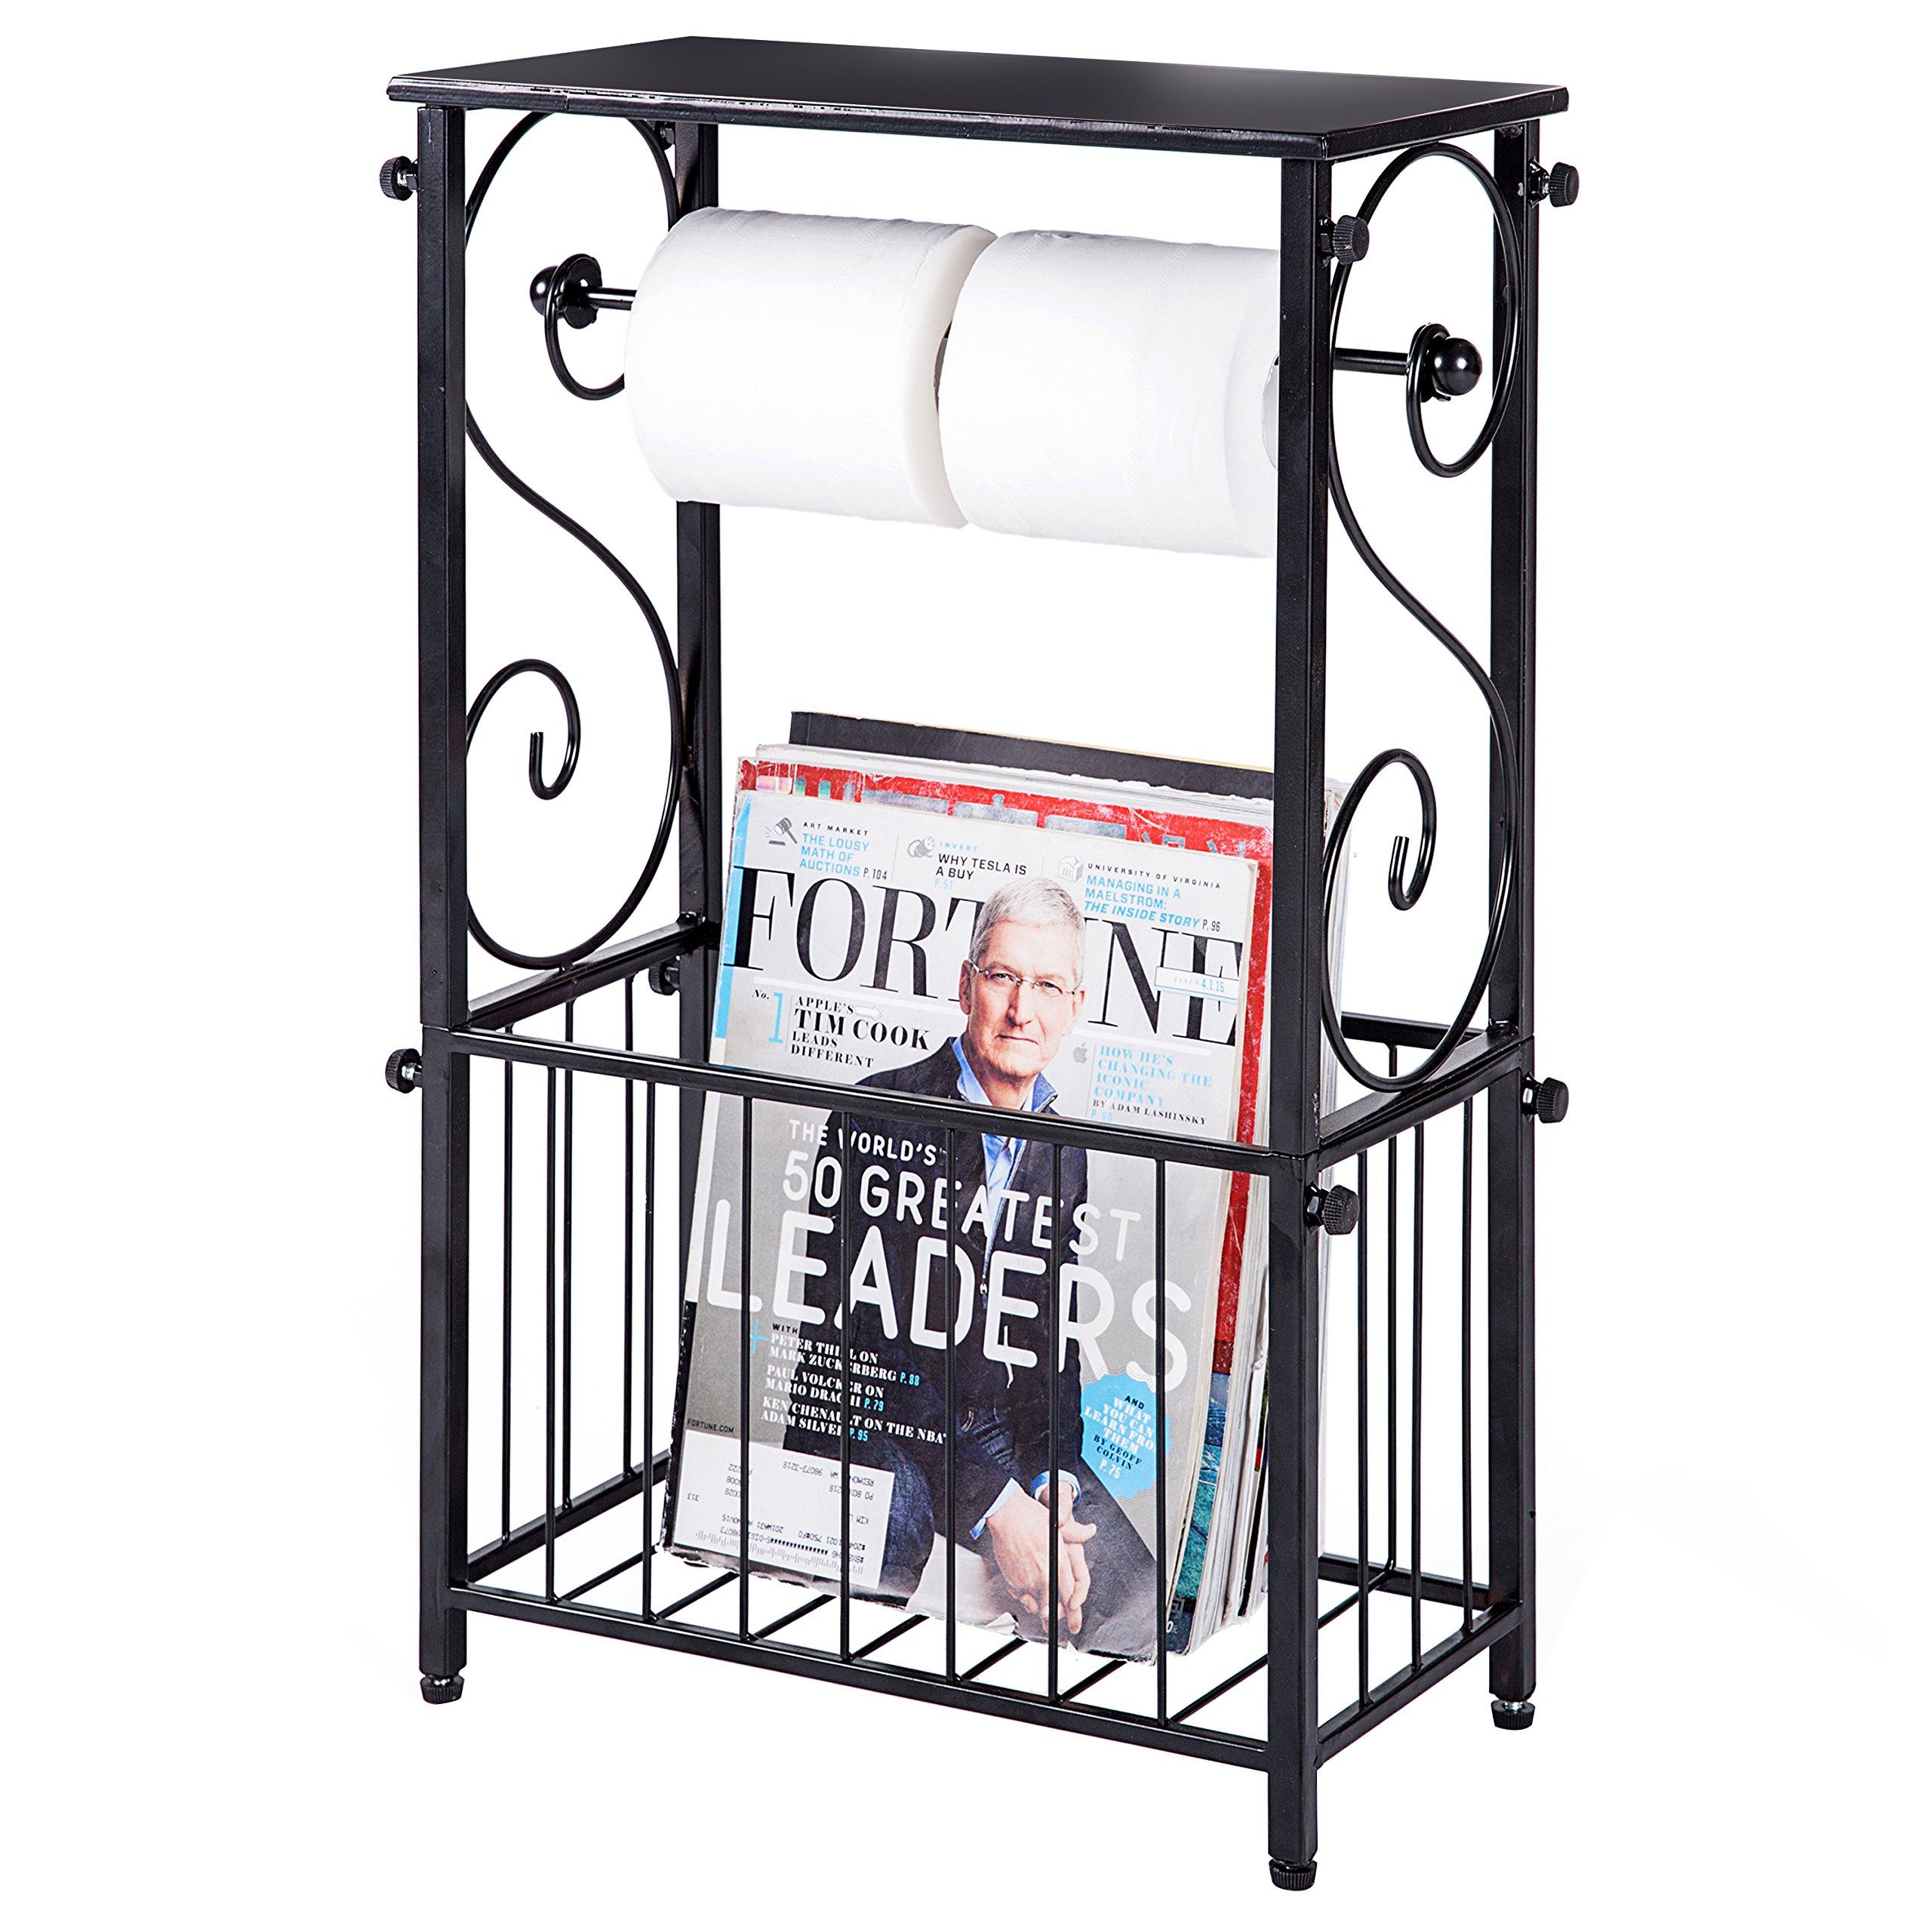 Metal Scroll Design Bathroom Storage Table Shelf with Toilet Paper Dispenser and Magazine Basket